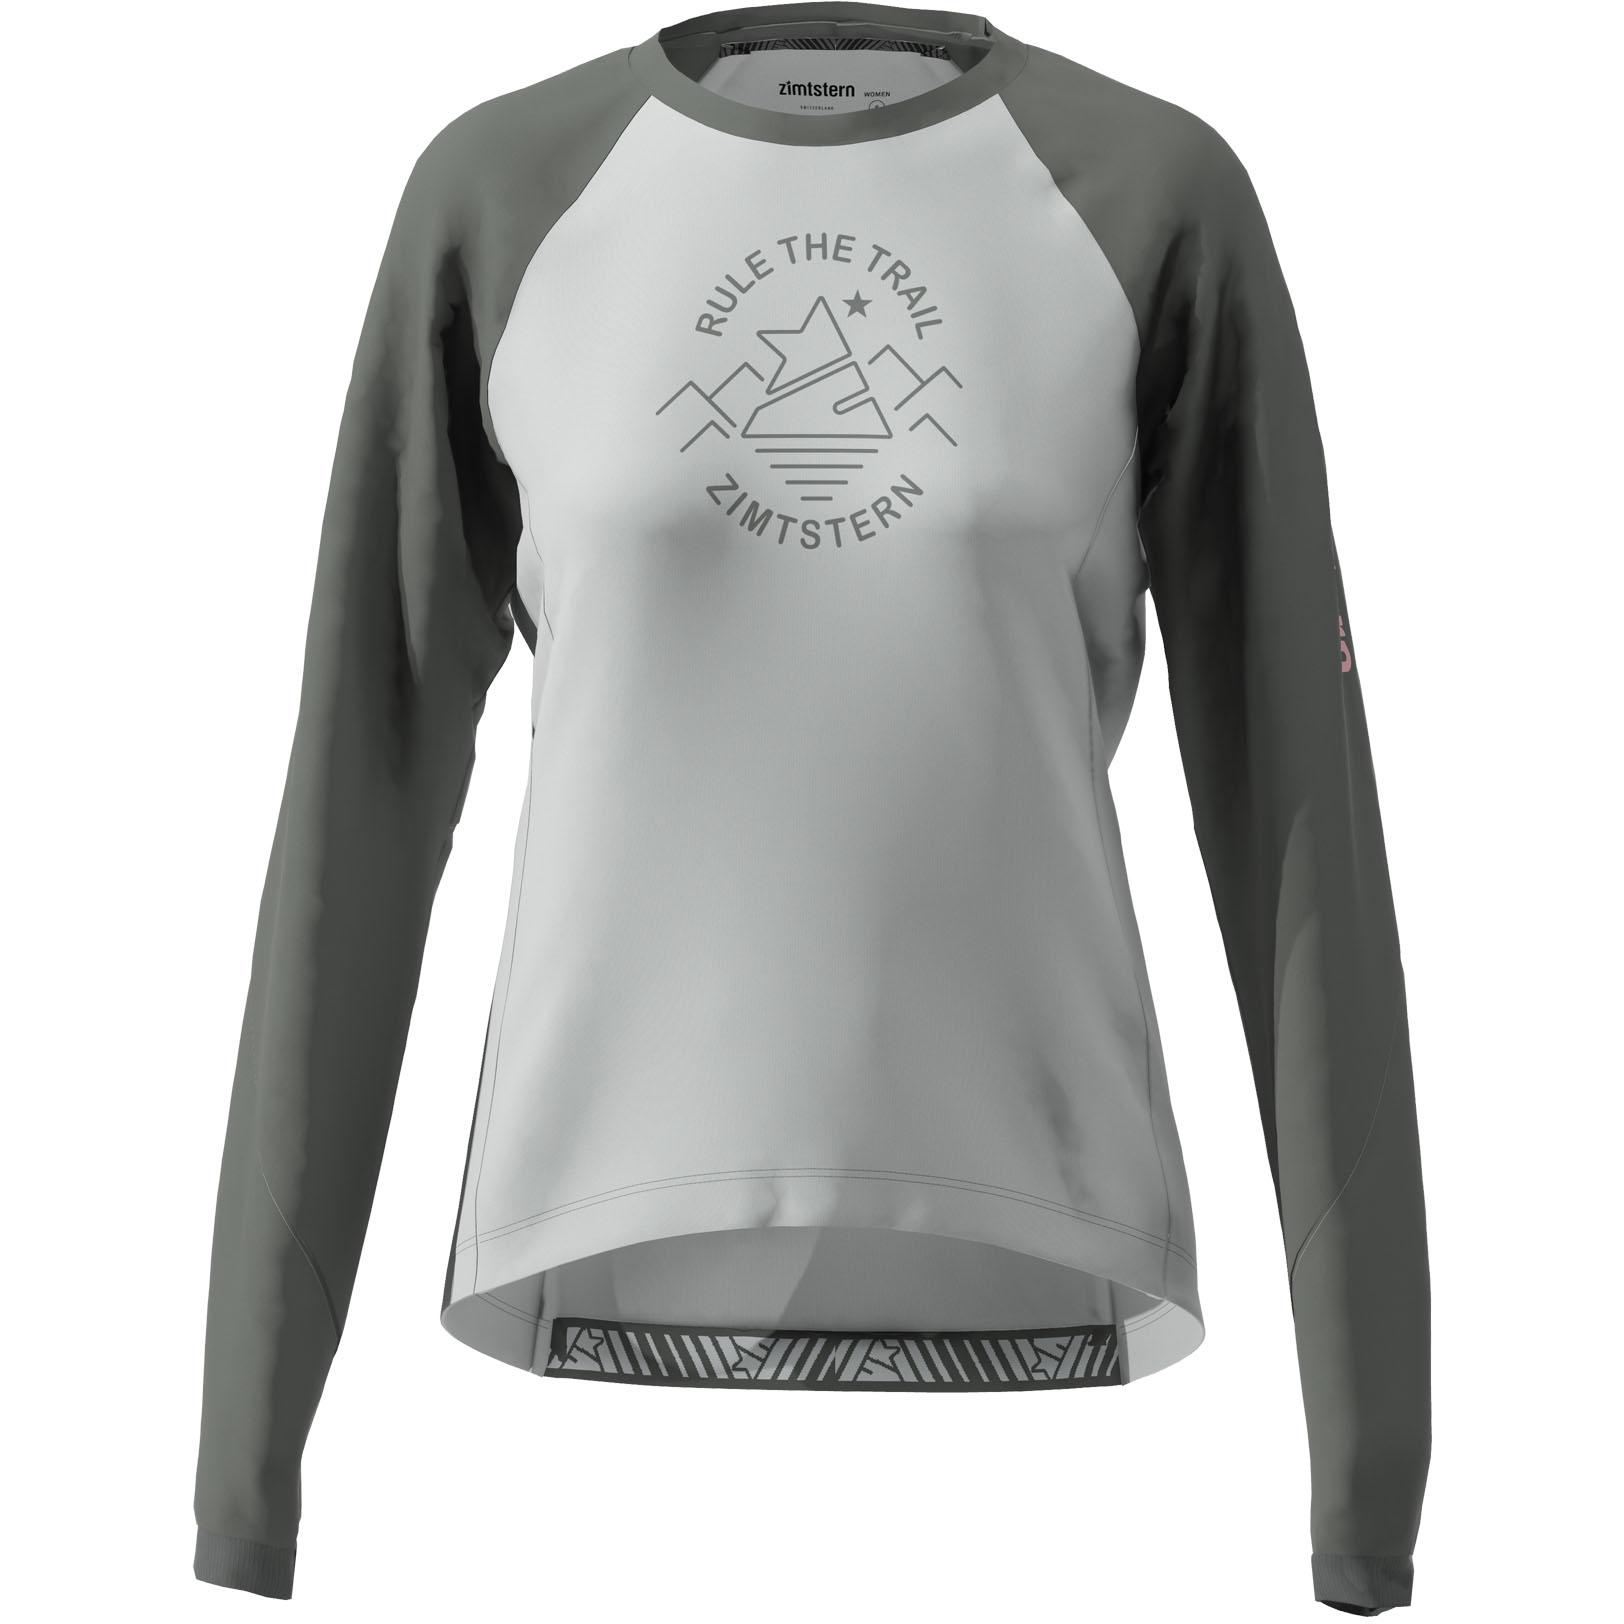 Zimtstern PureFlowz Langarm-Shirt Damen - glacier grey/gun metal